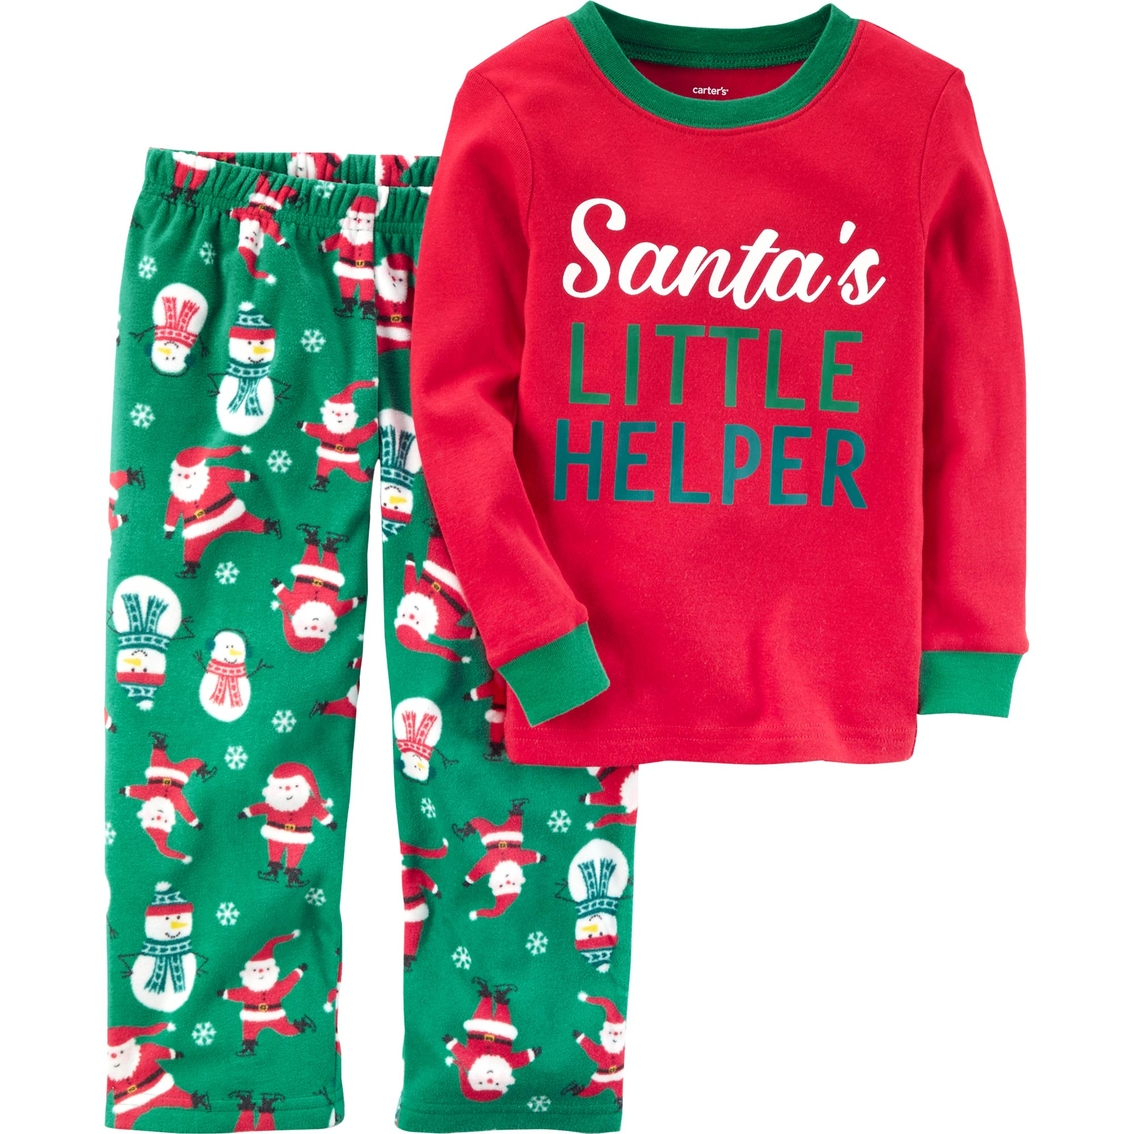 db7632cf31c1 Carter s Little Boys 2 Pc. Santa s Little Helper Pajama Set